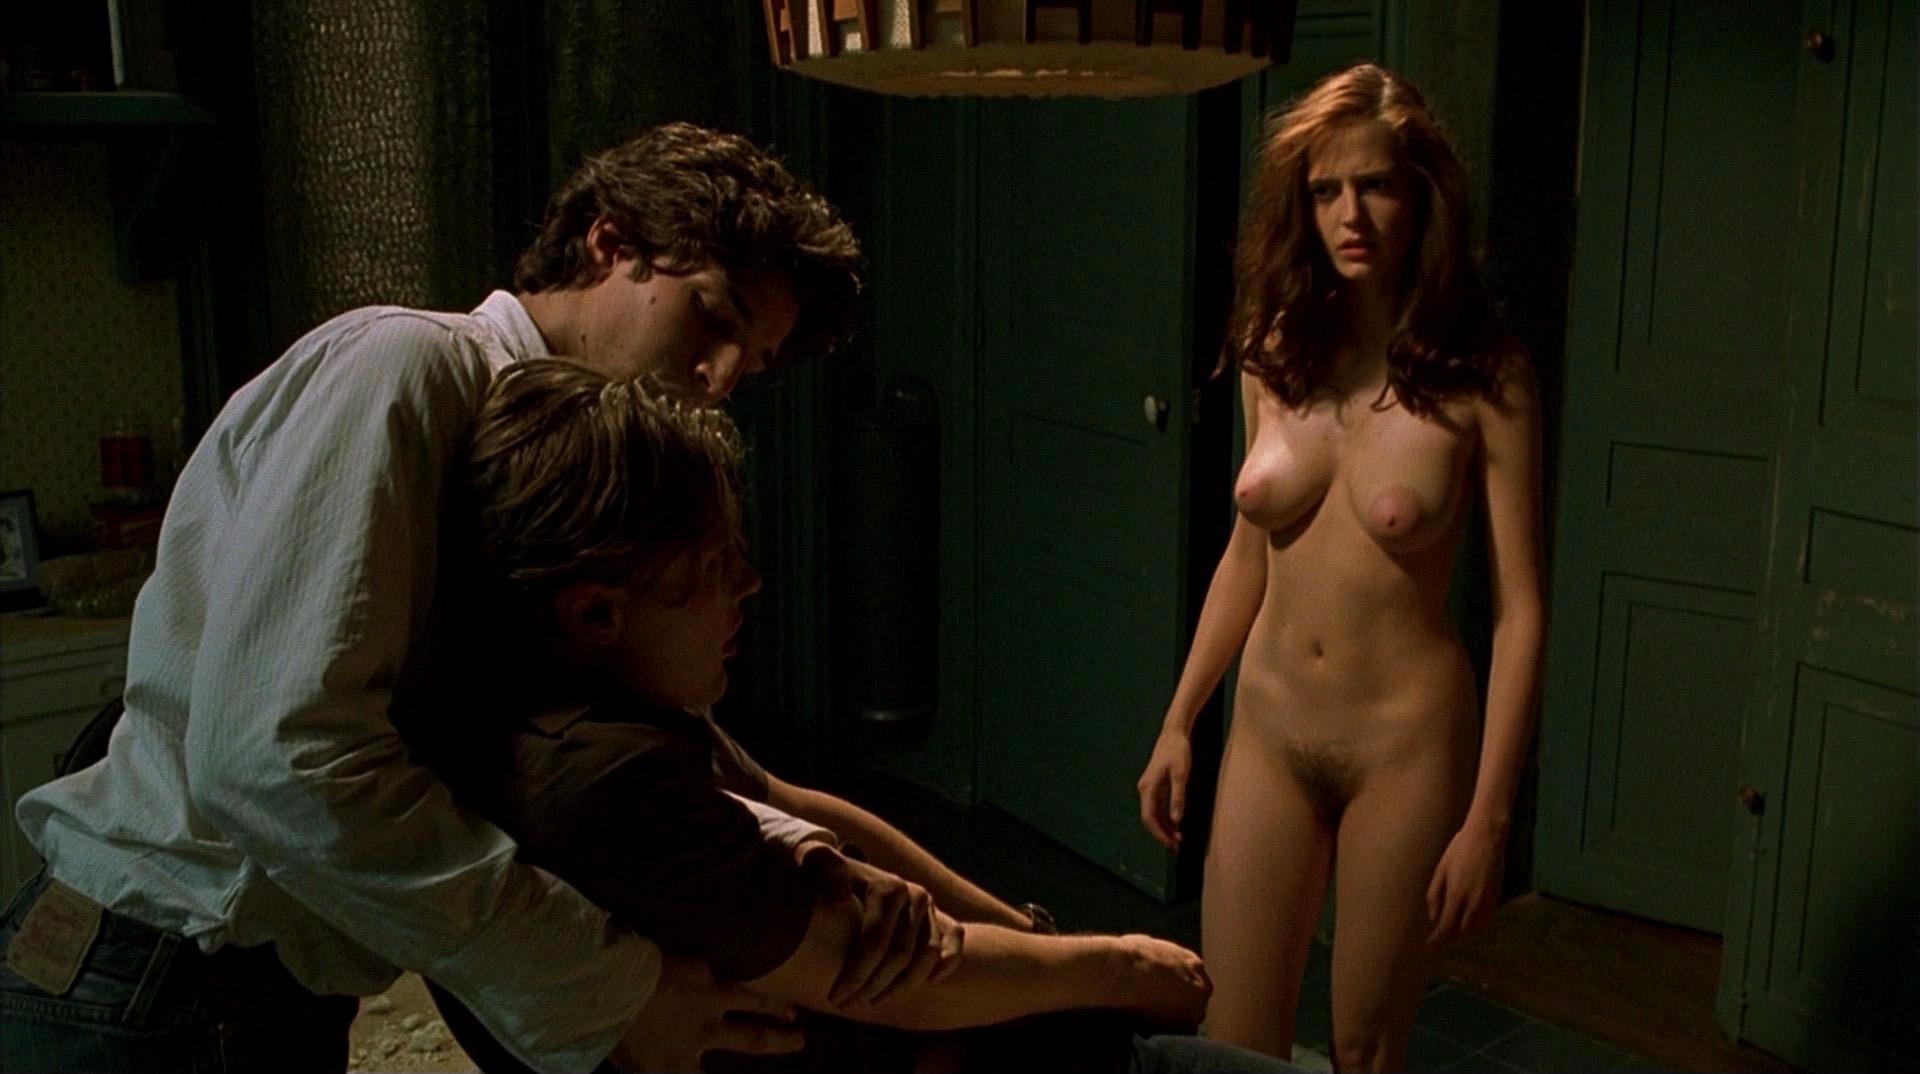 Film Porno Eva watch online - eva green – the dreamers (2003) hd 1080p